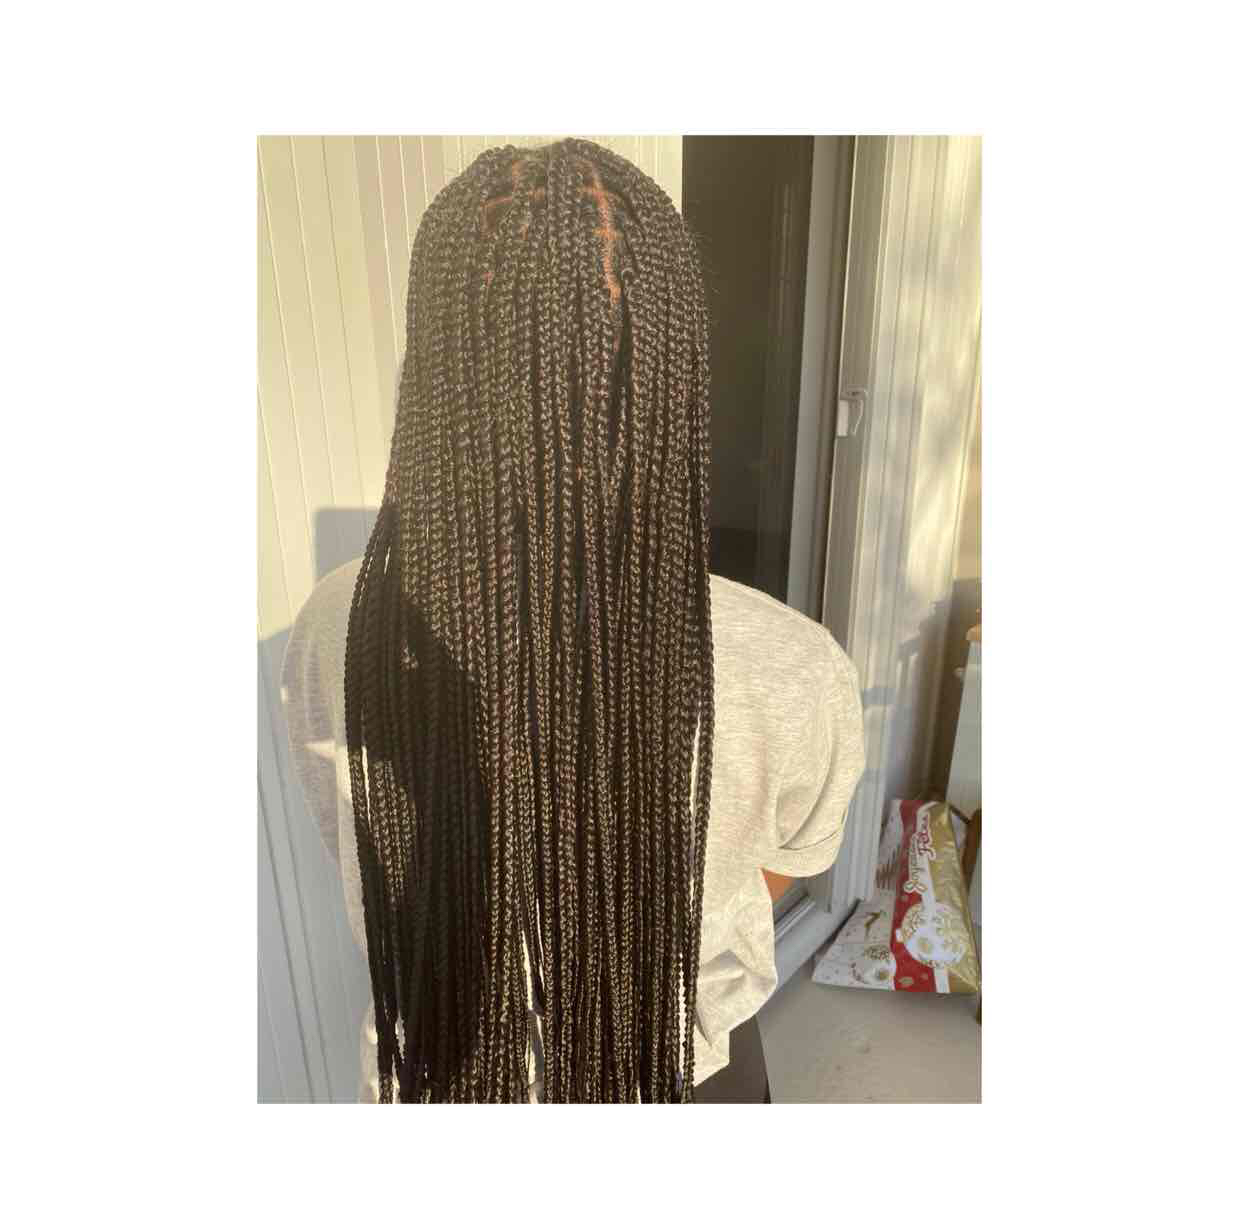 salon de coiffure afro tresse tresses box braids crochet braids vanilles tissages paris 75 77 78 91 92 93 94 95 MHTTYXJK